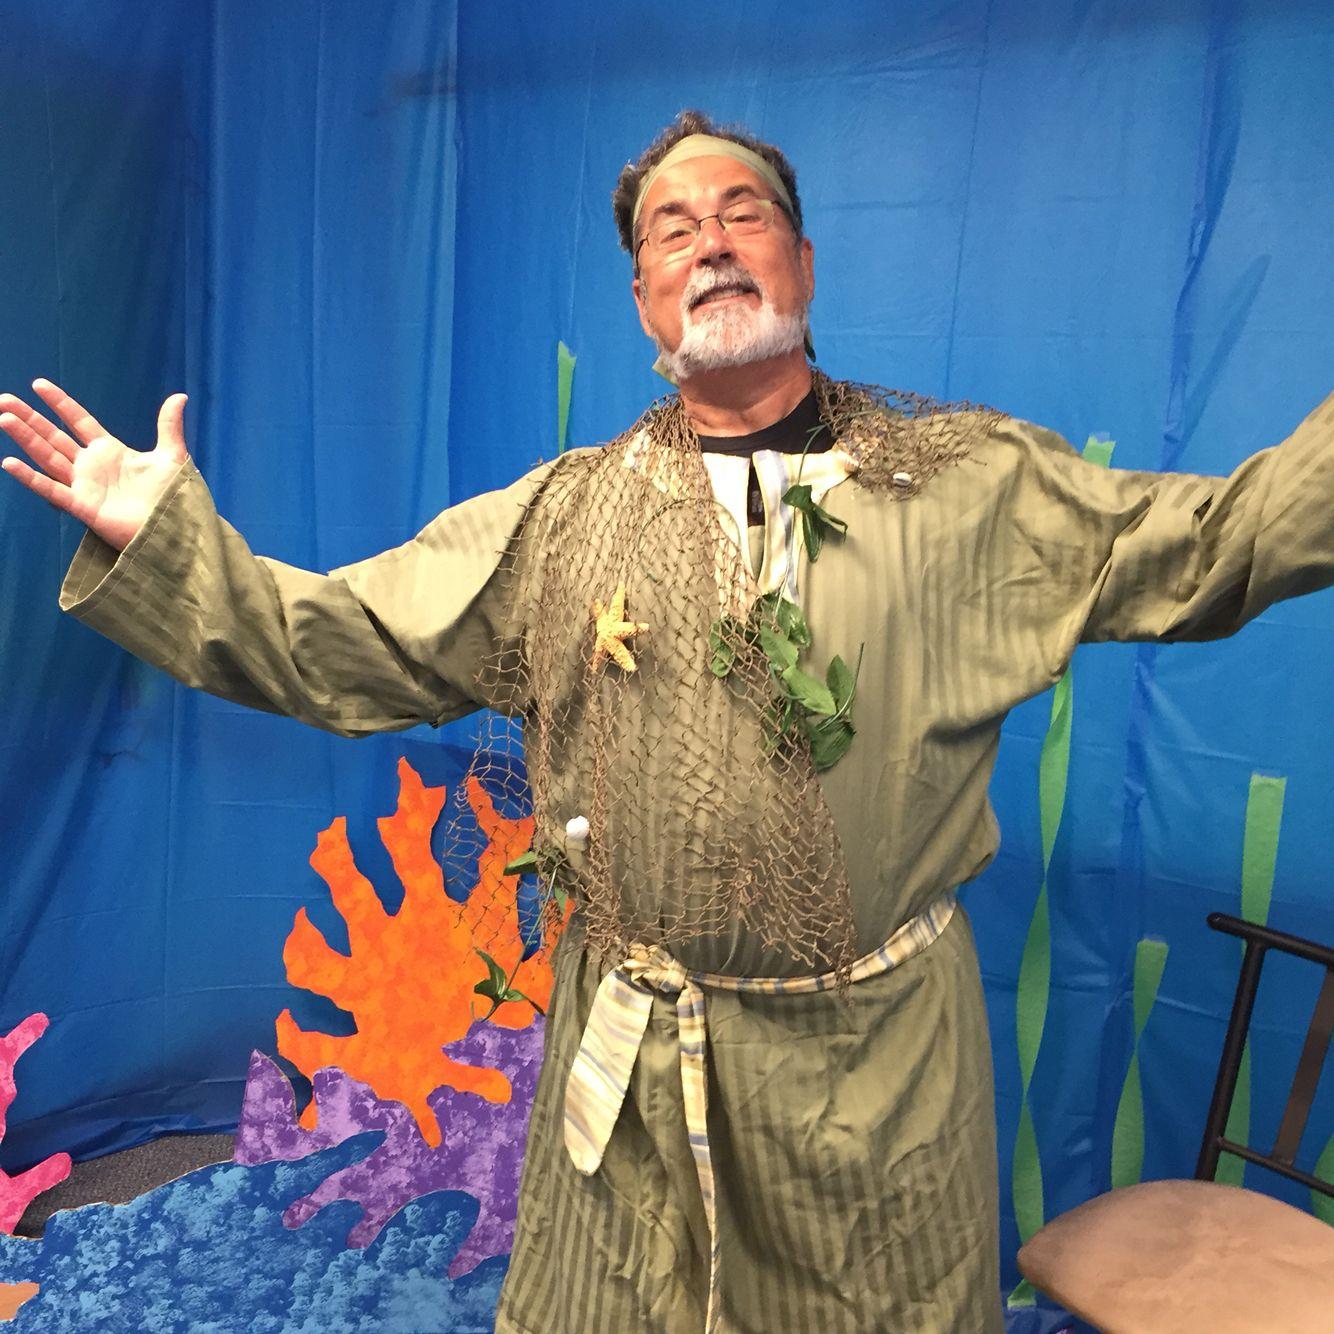 Summer Seaquest VBS Costumes  - Jonah